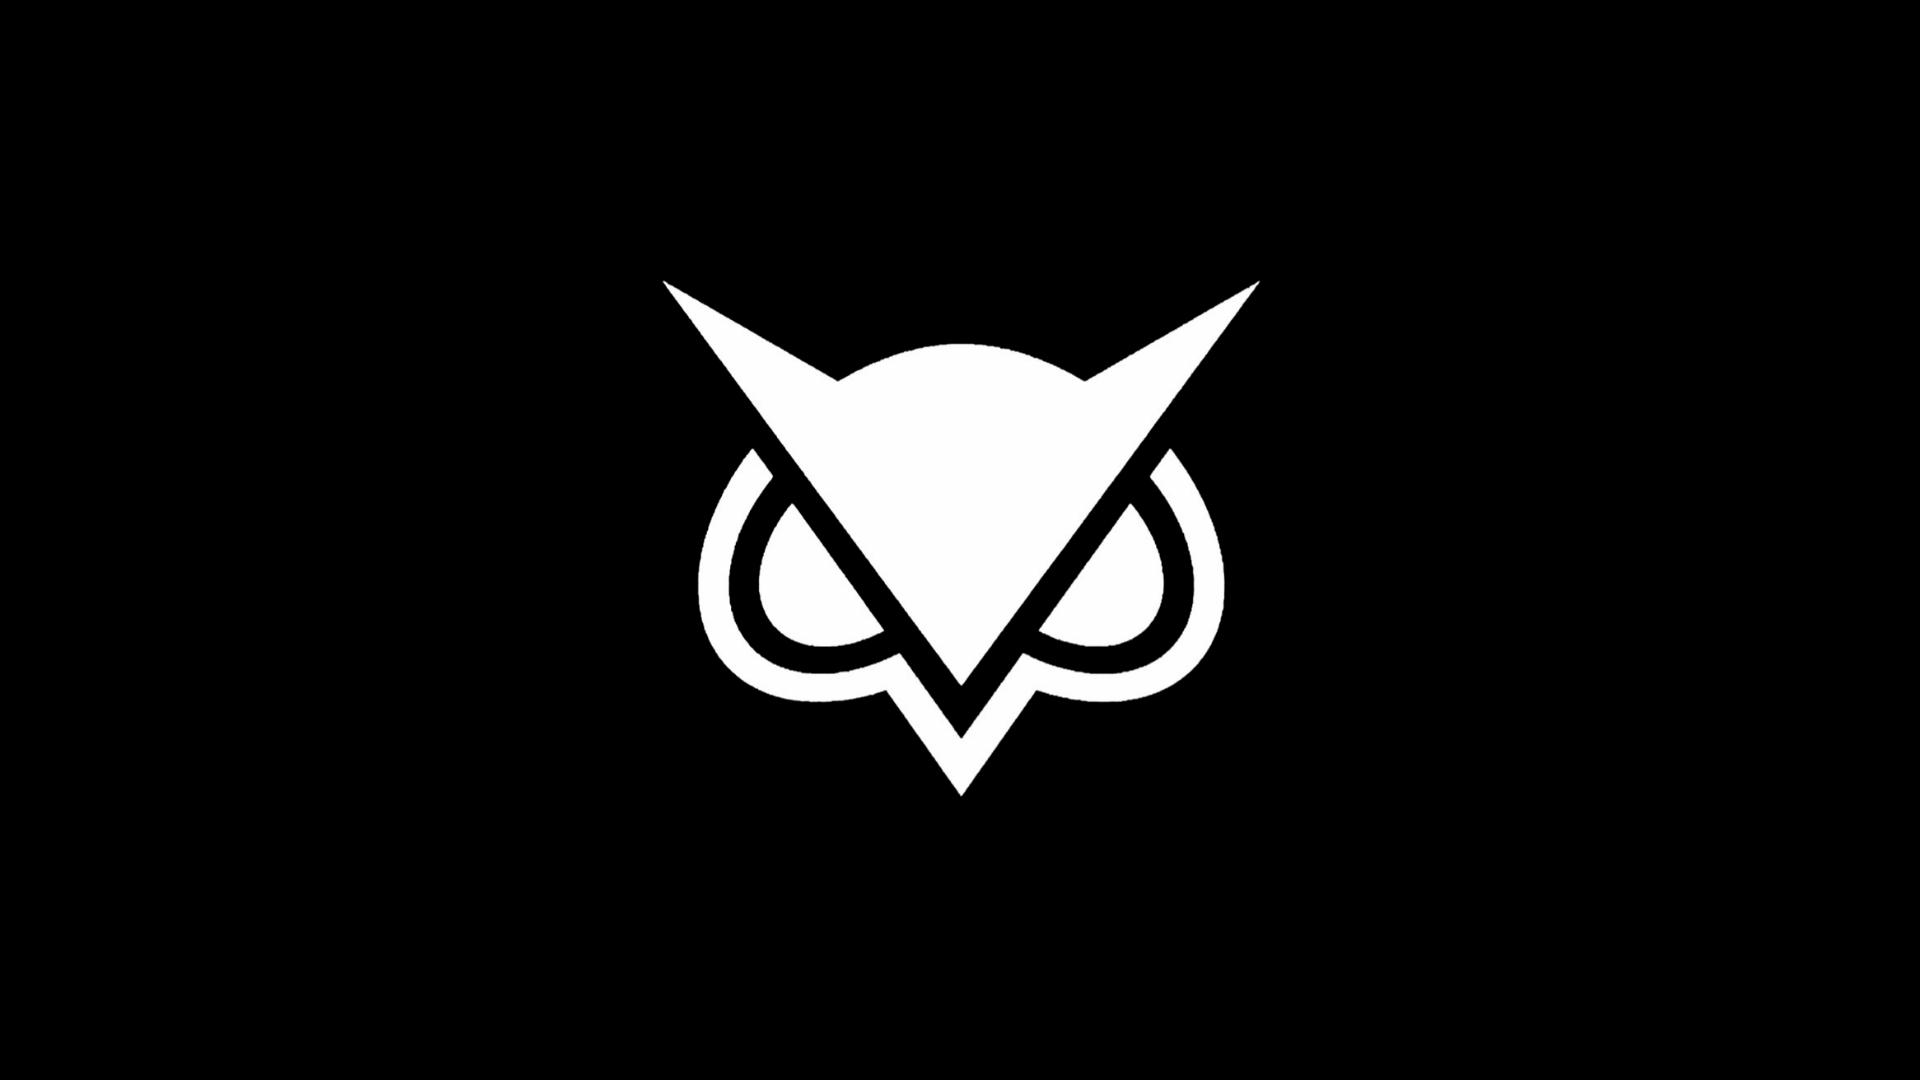 All Blacks Logo Wallpapers